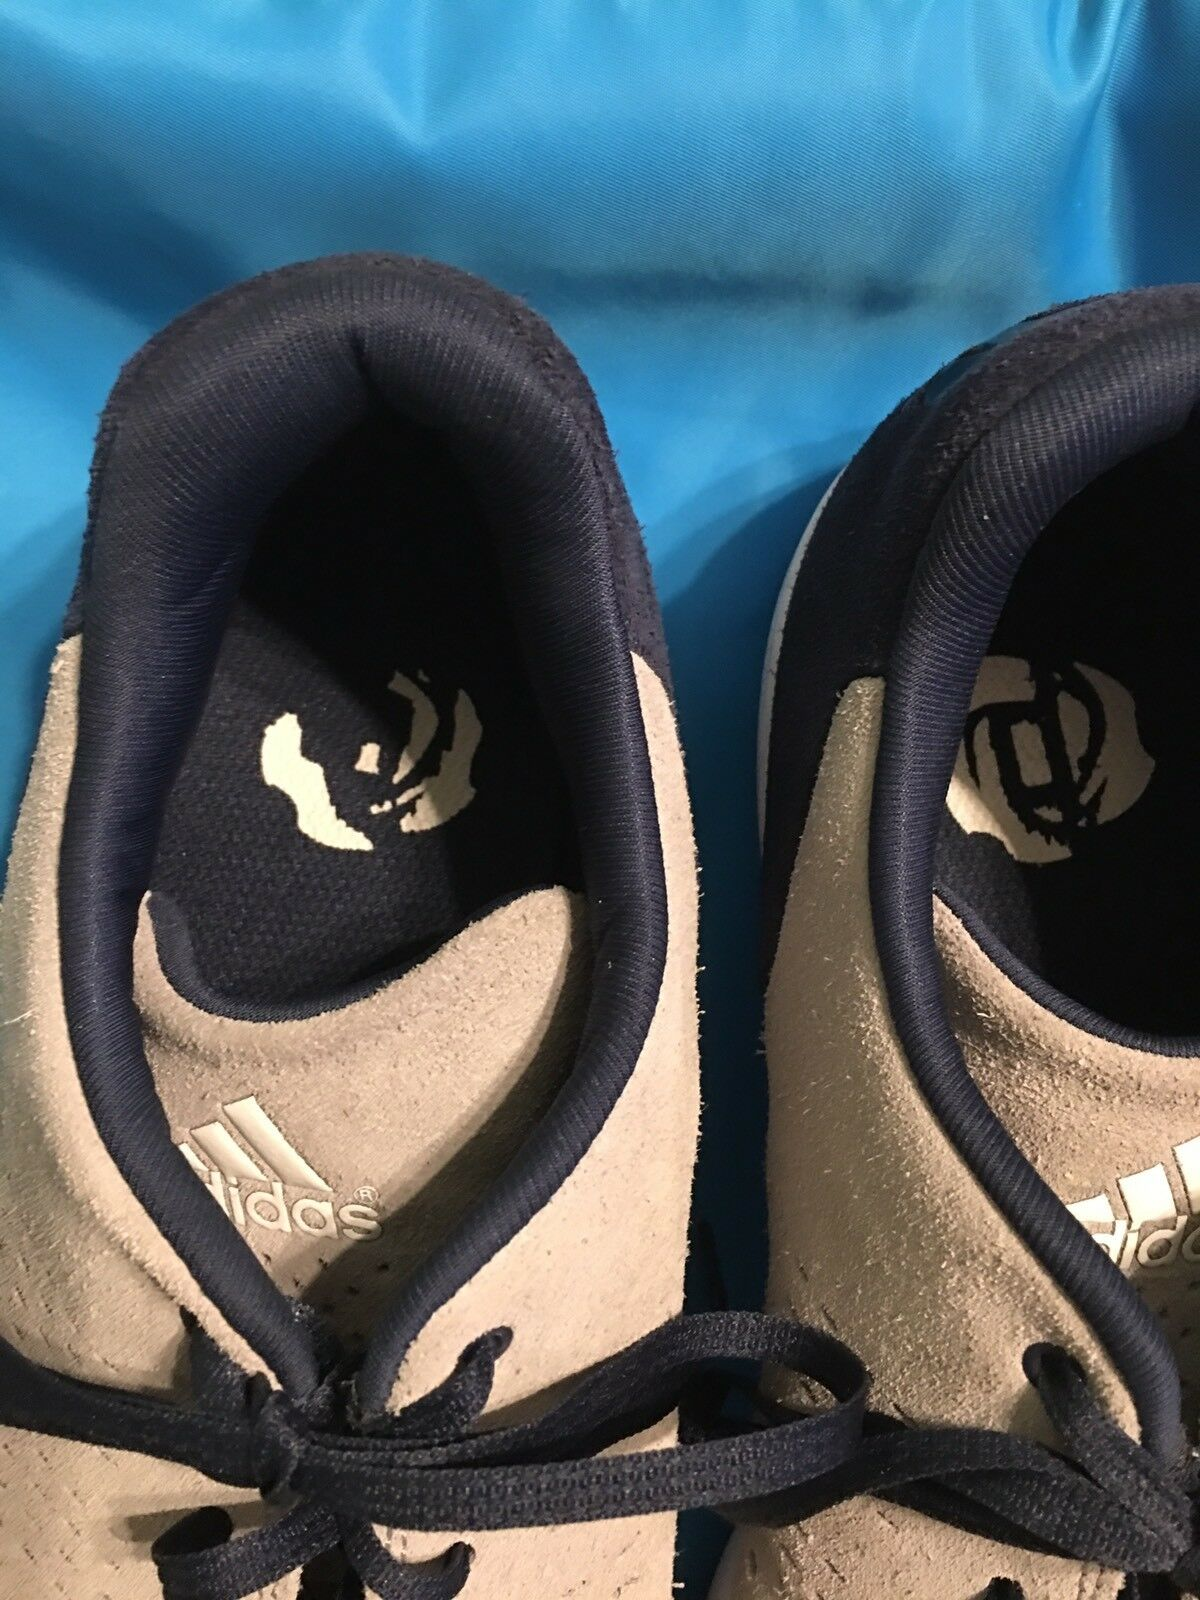 Addidas mens grigio   marina scarpe sz sz sz 12 | Ordini Sono Benvenuti  a16a79